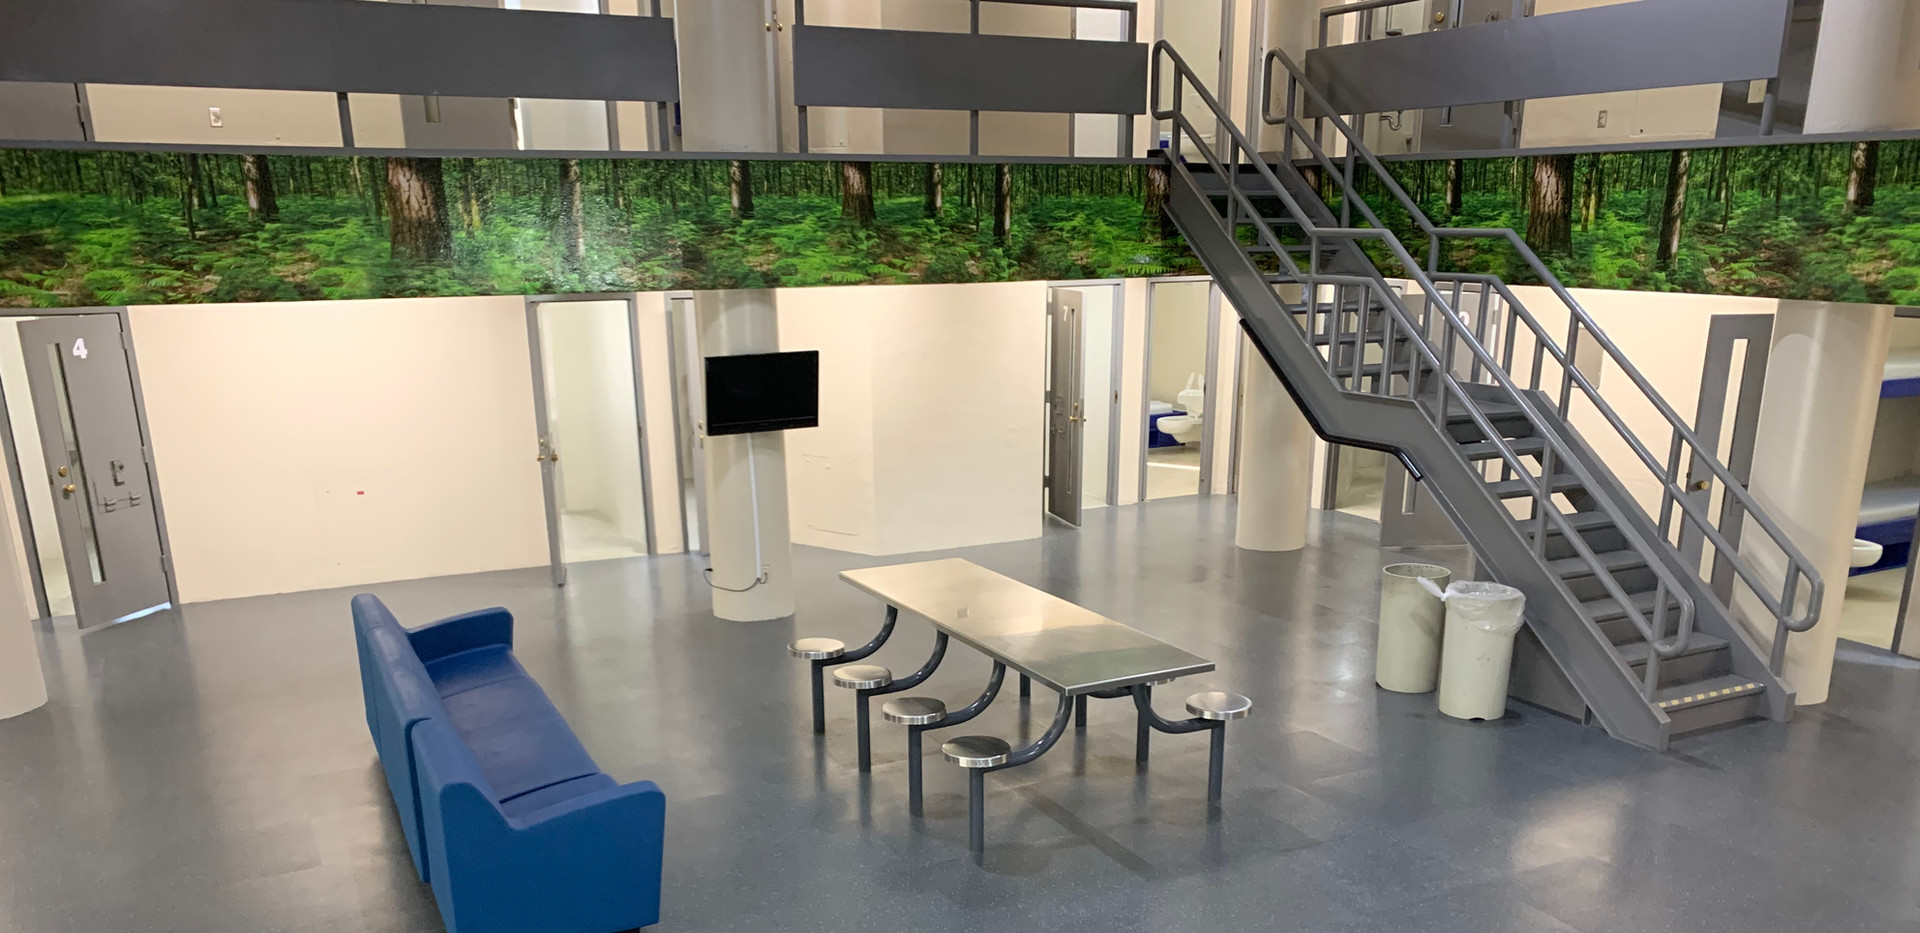 County Jail - Ward Flooring